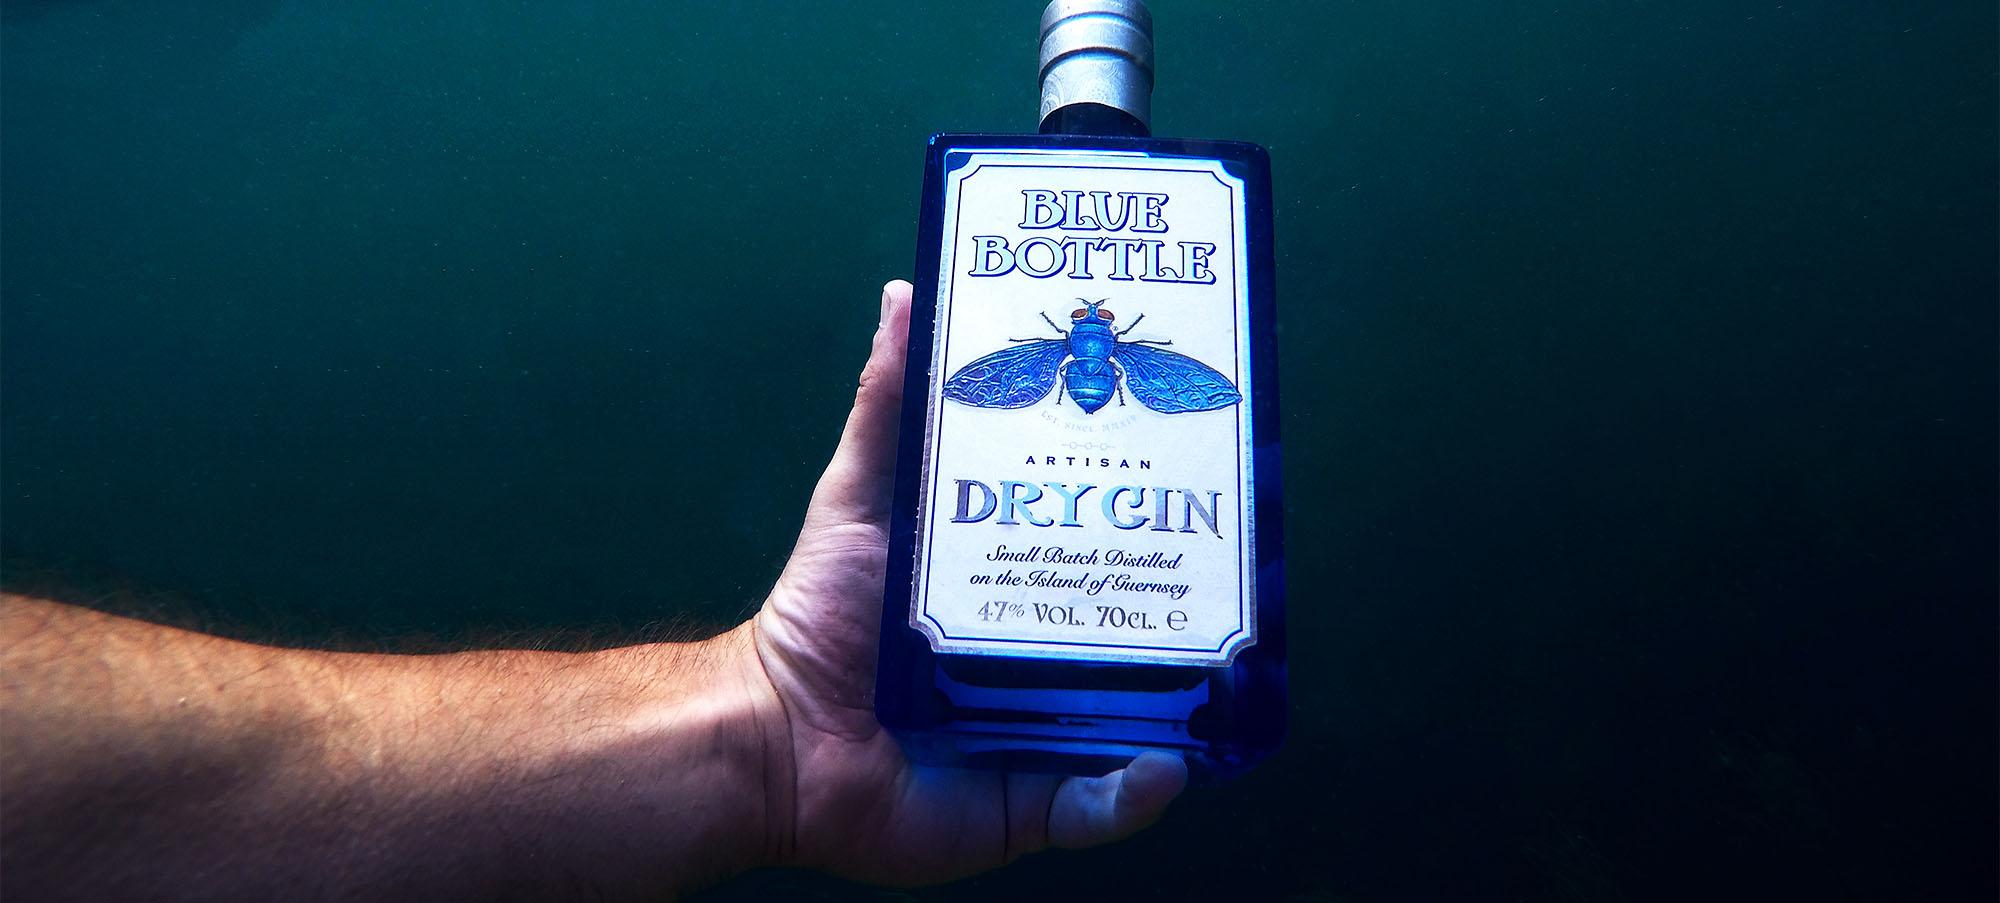 Randalls Brewery - Blue Bottle Gin